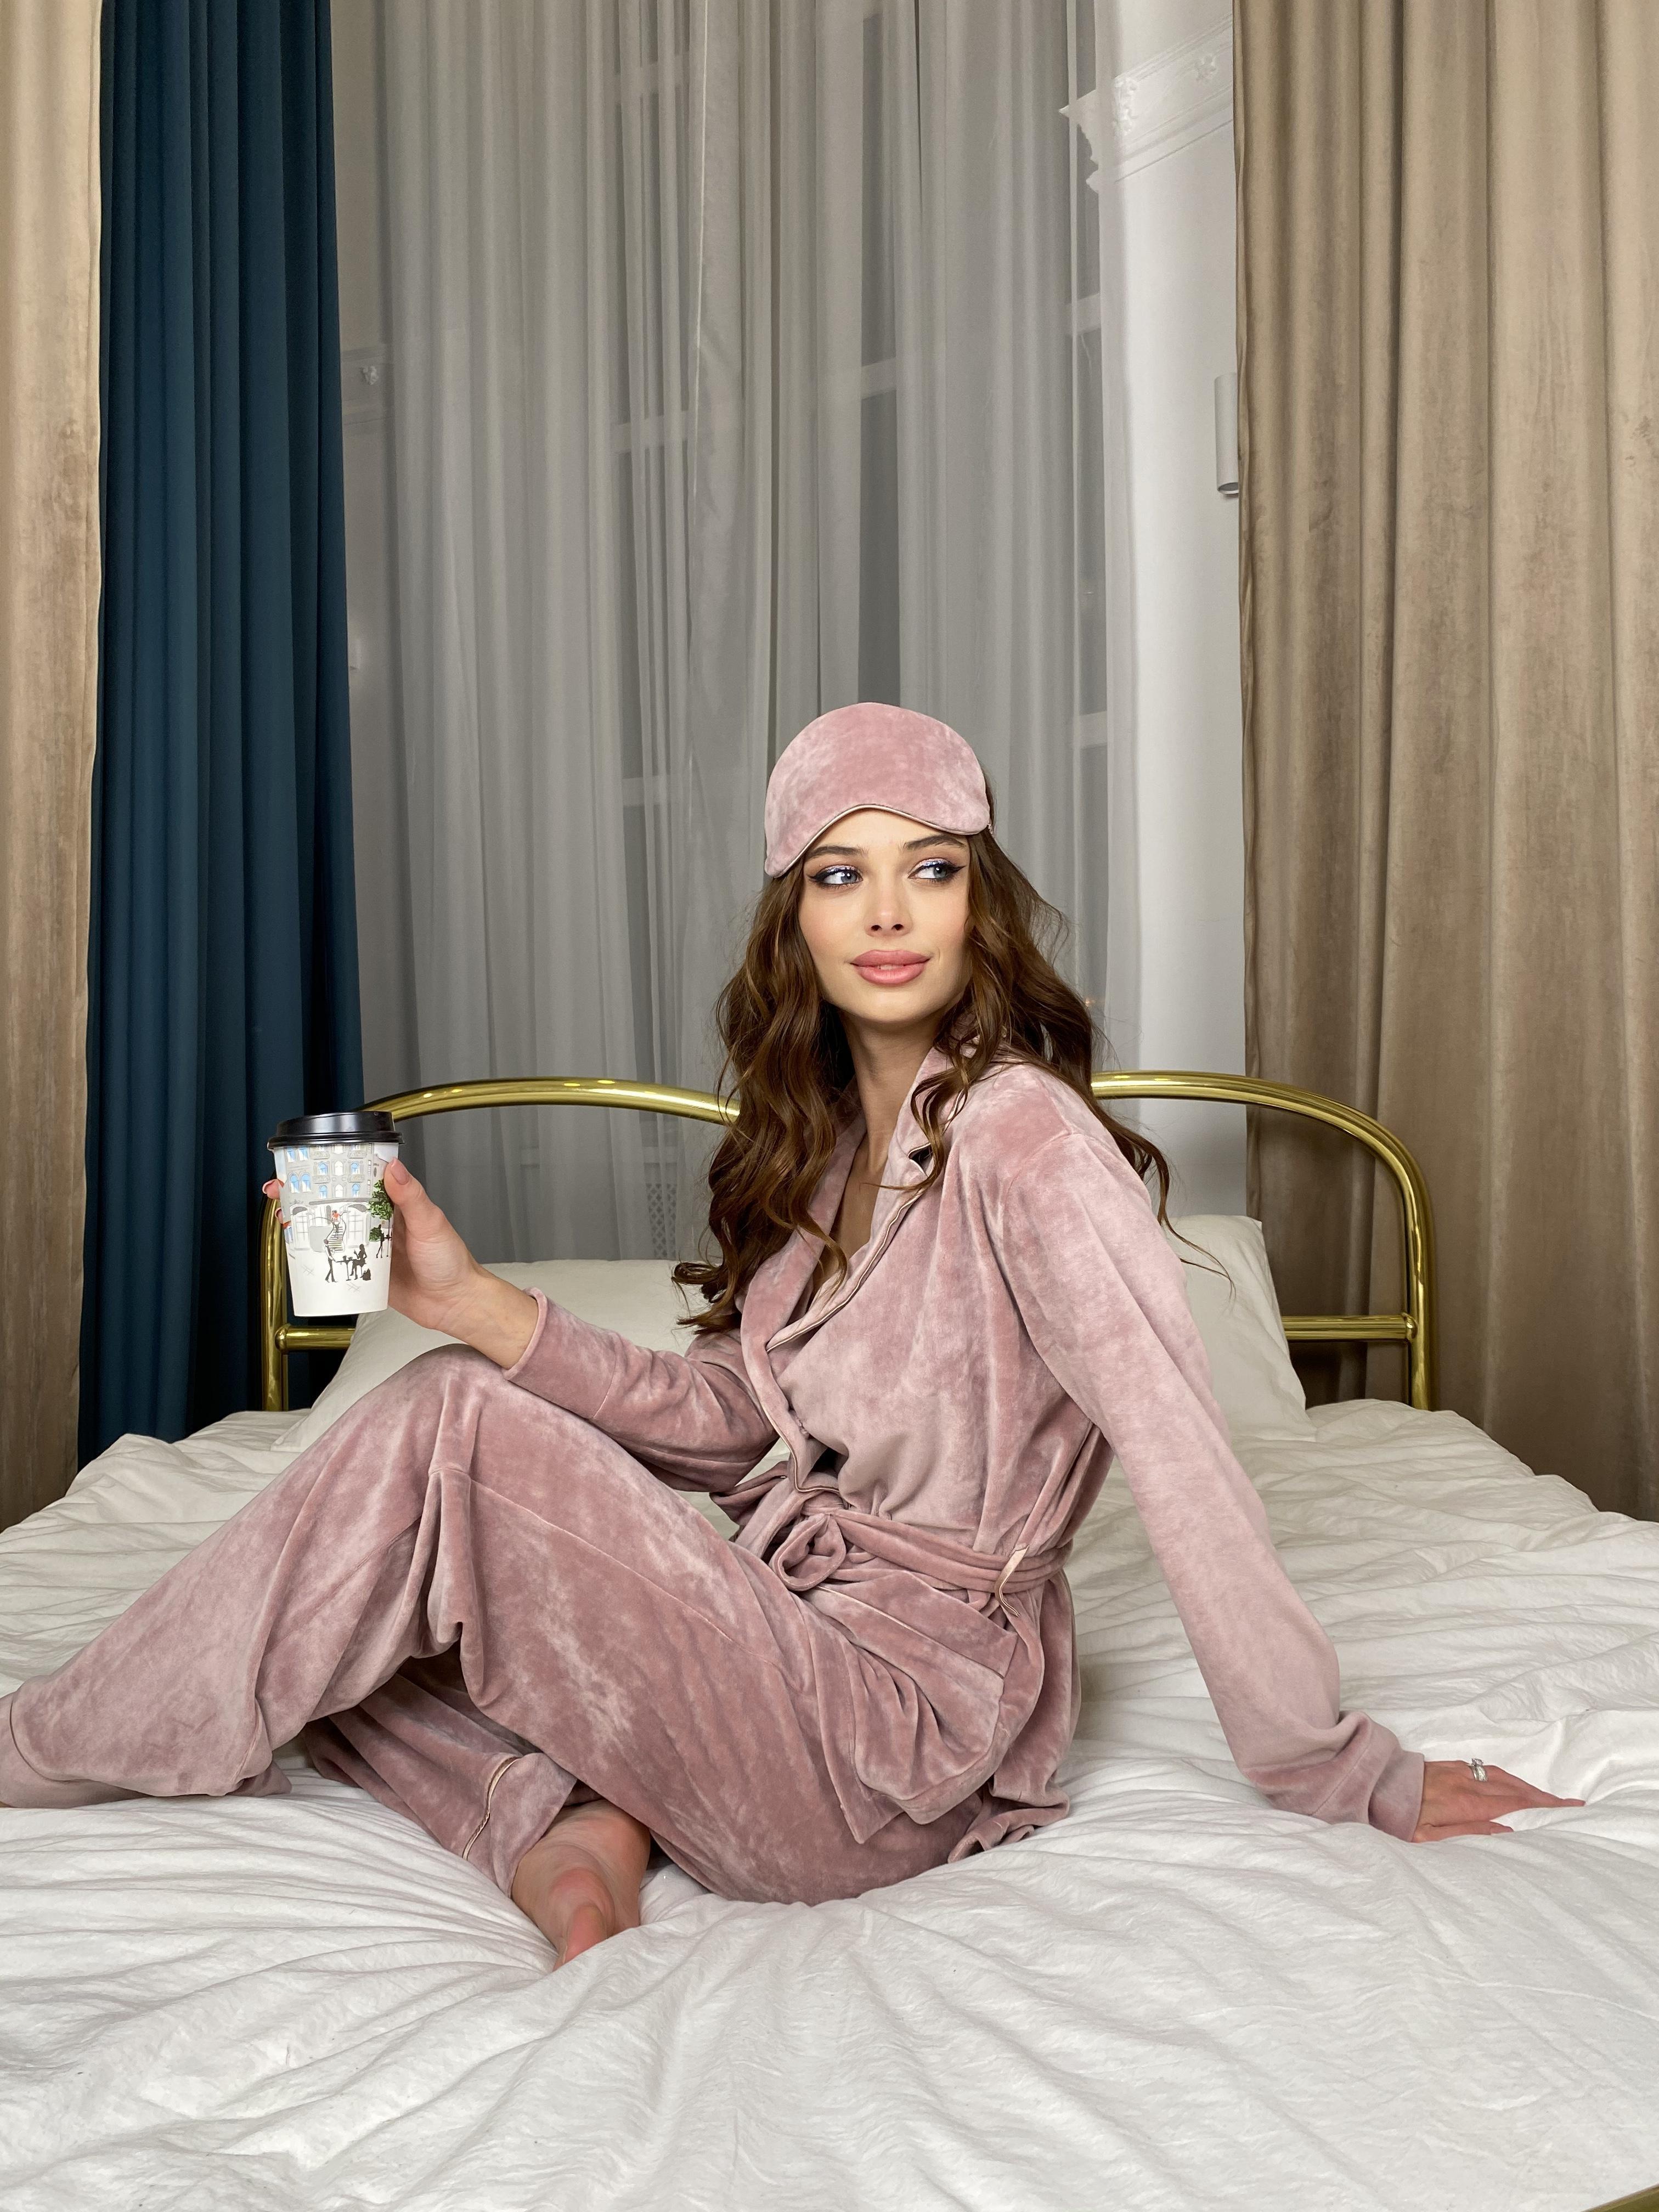 Шайн пижама велюр жакет брюки маска для сна 10353 АРТ. 46660 Цвет: Пудра - фото 9, интернет магазин tm-modus.ru